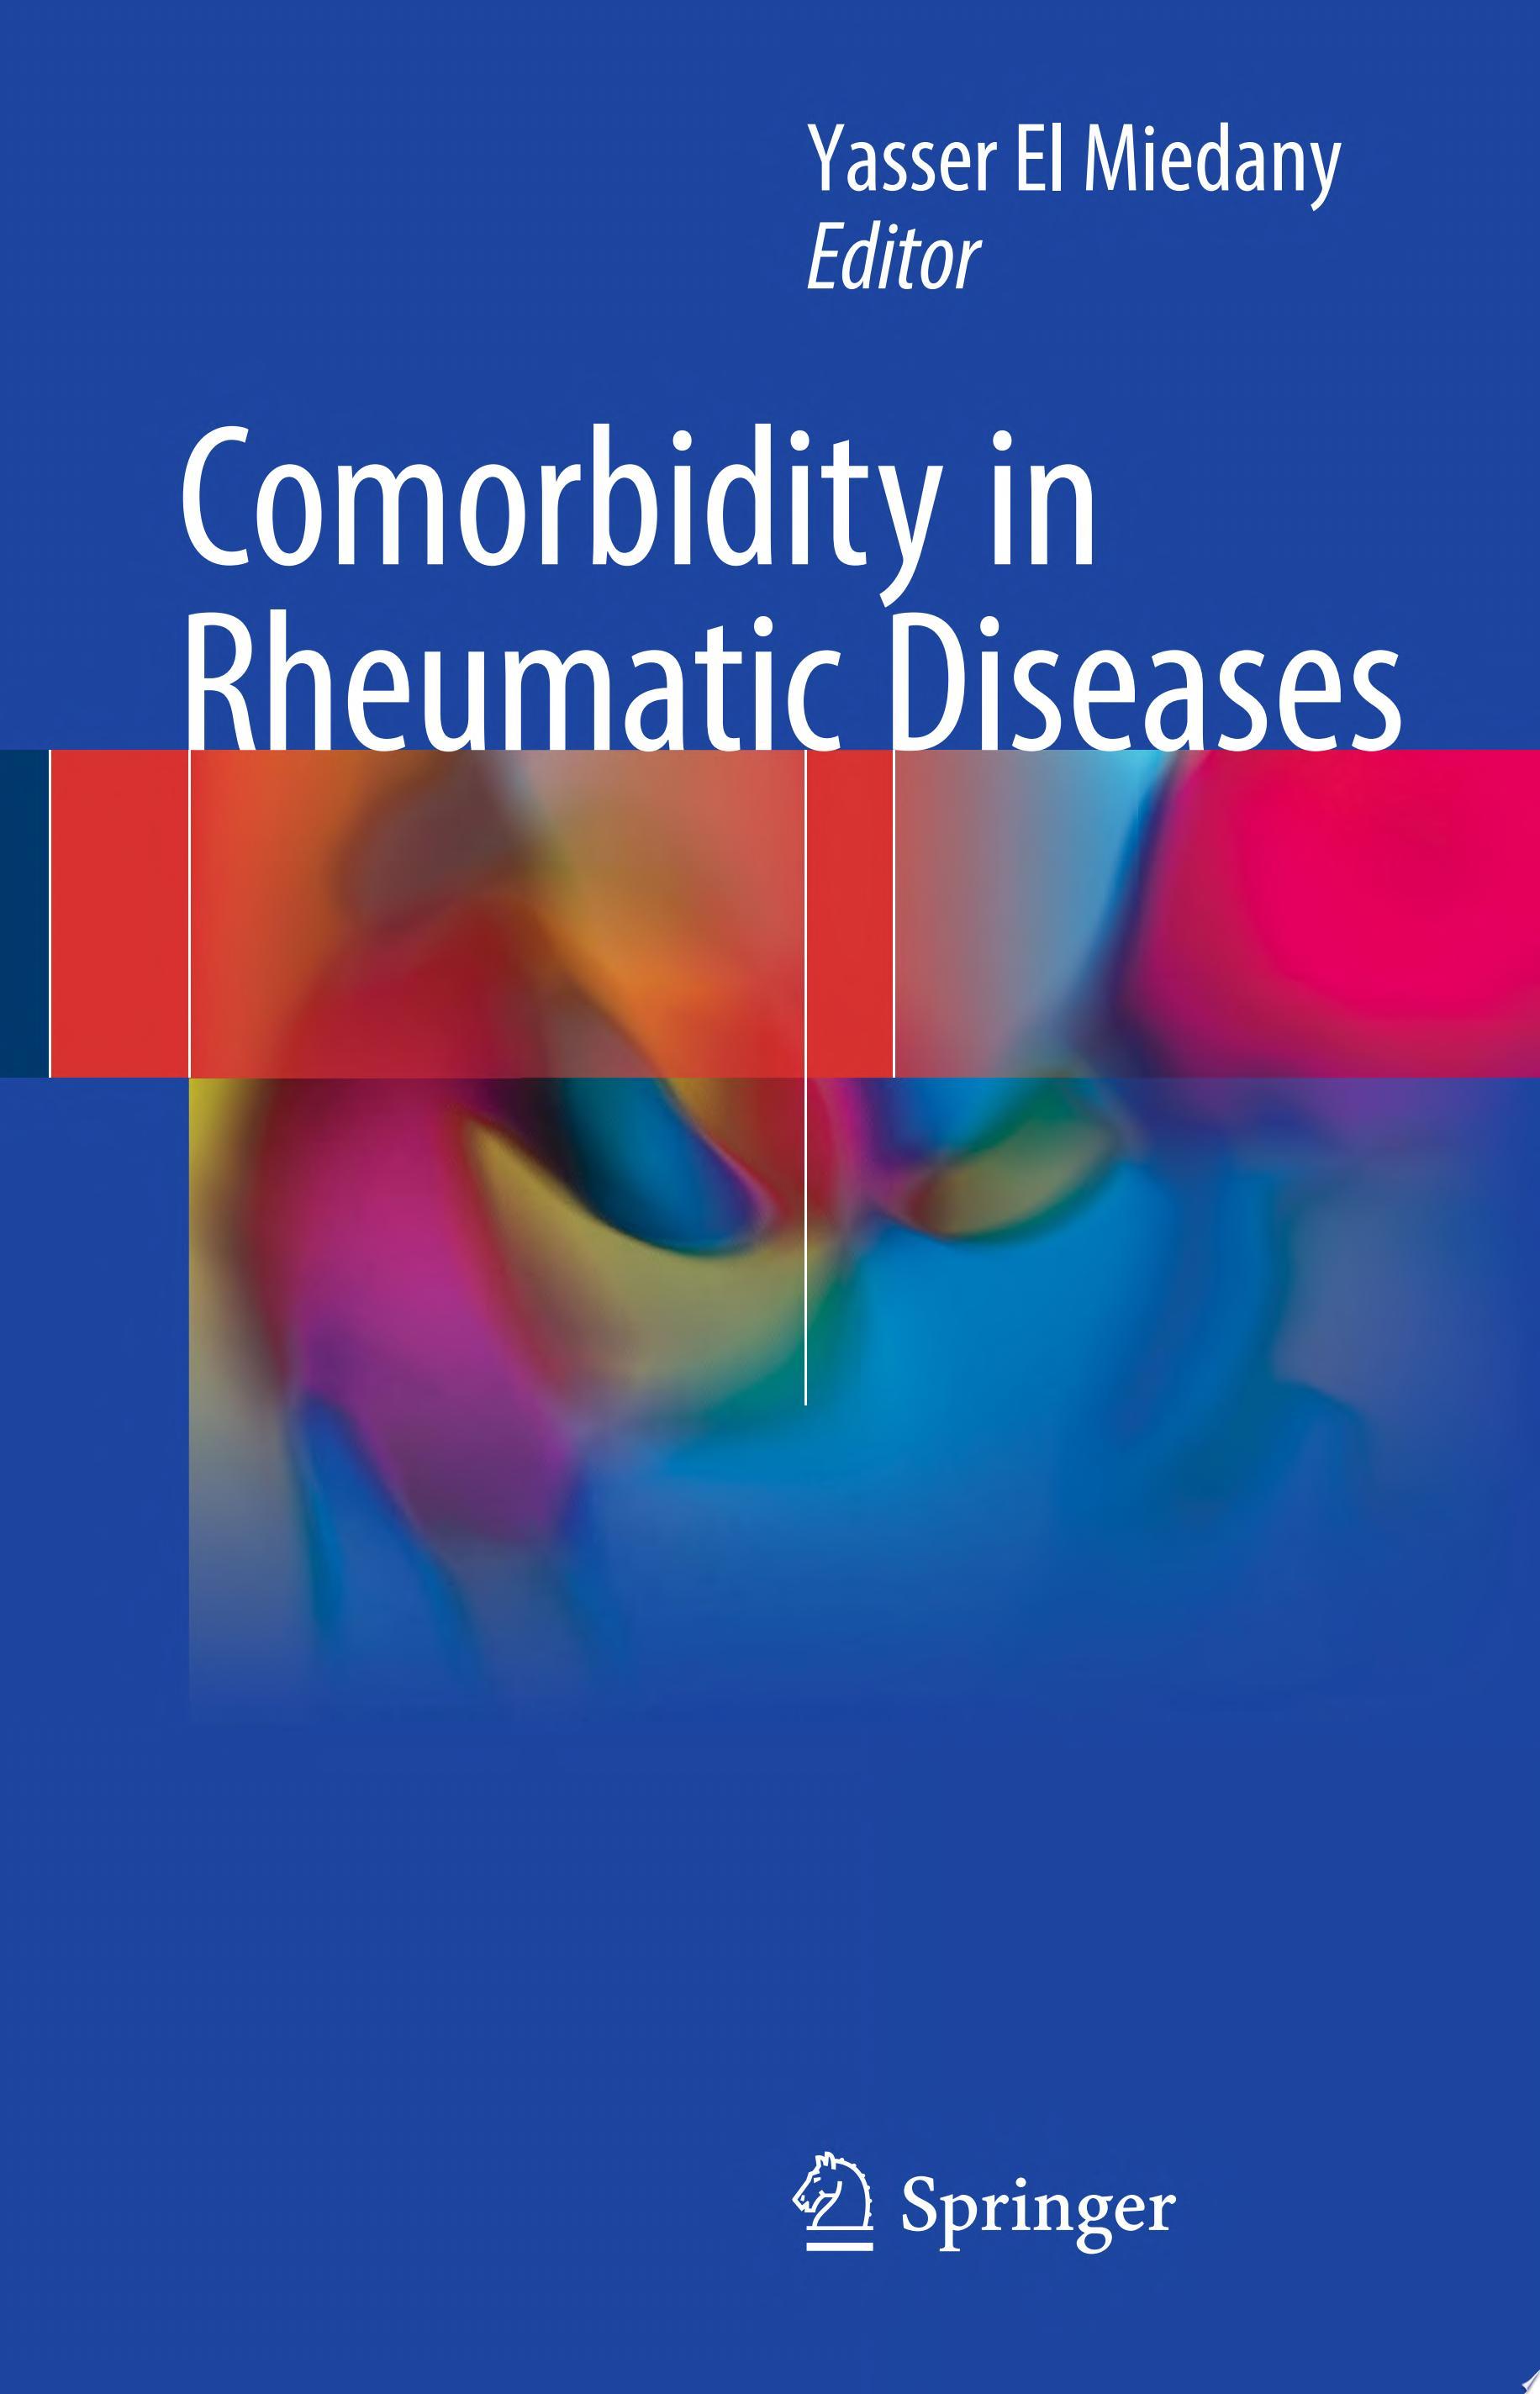 Comorbidity in Rheumatic Diseases